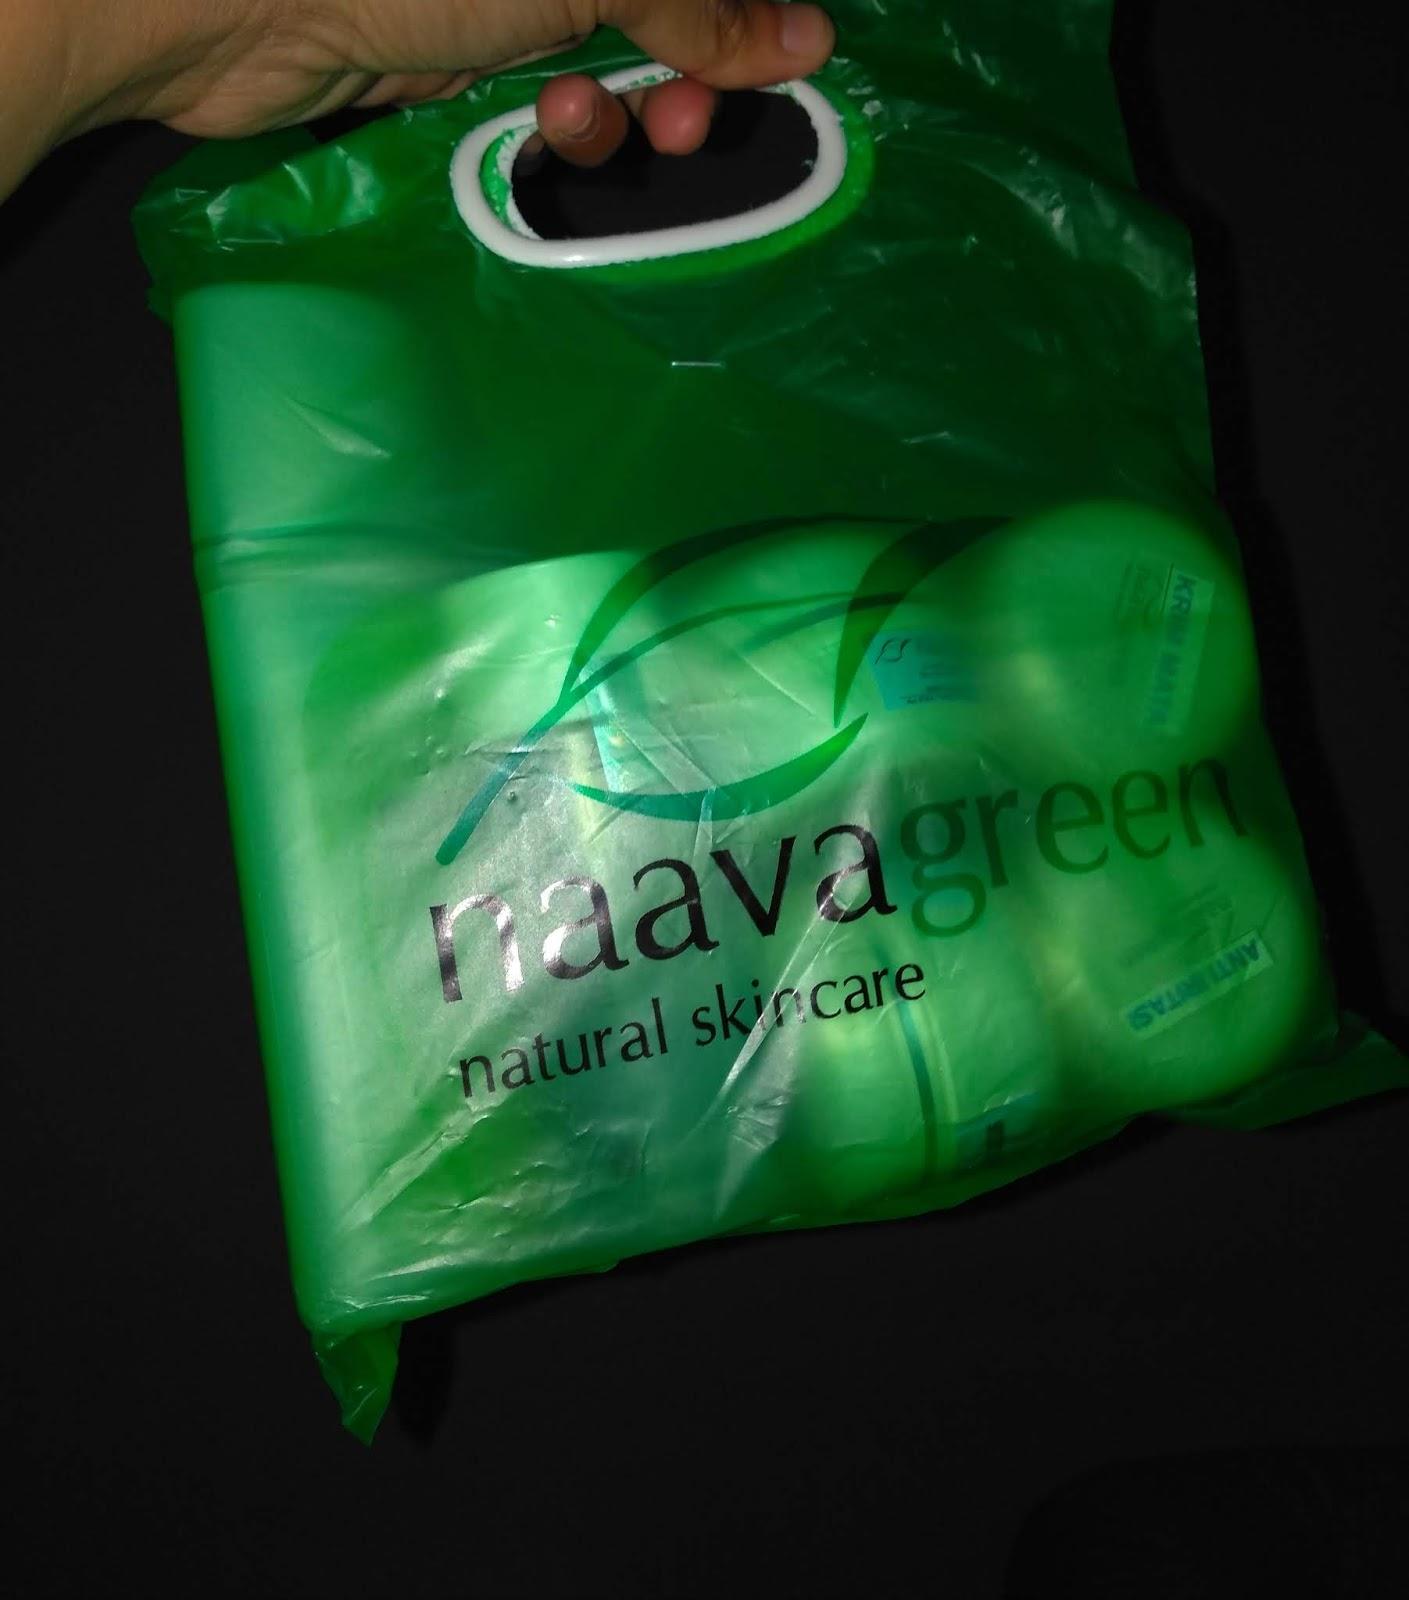 Pengalaman Pertama Kali Treatment Acne Di Naavagreen Surabaya [ REVIEW ]